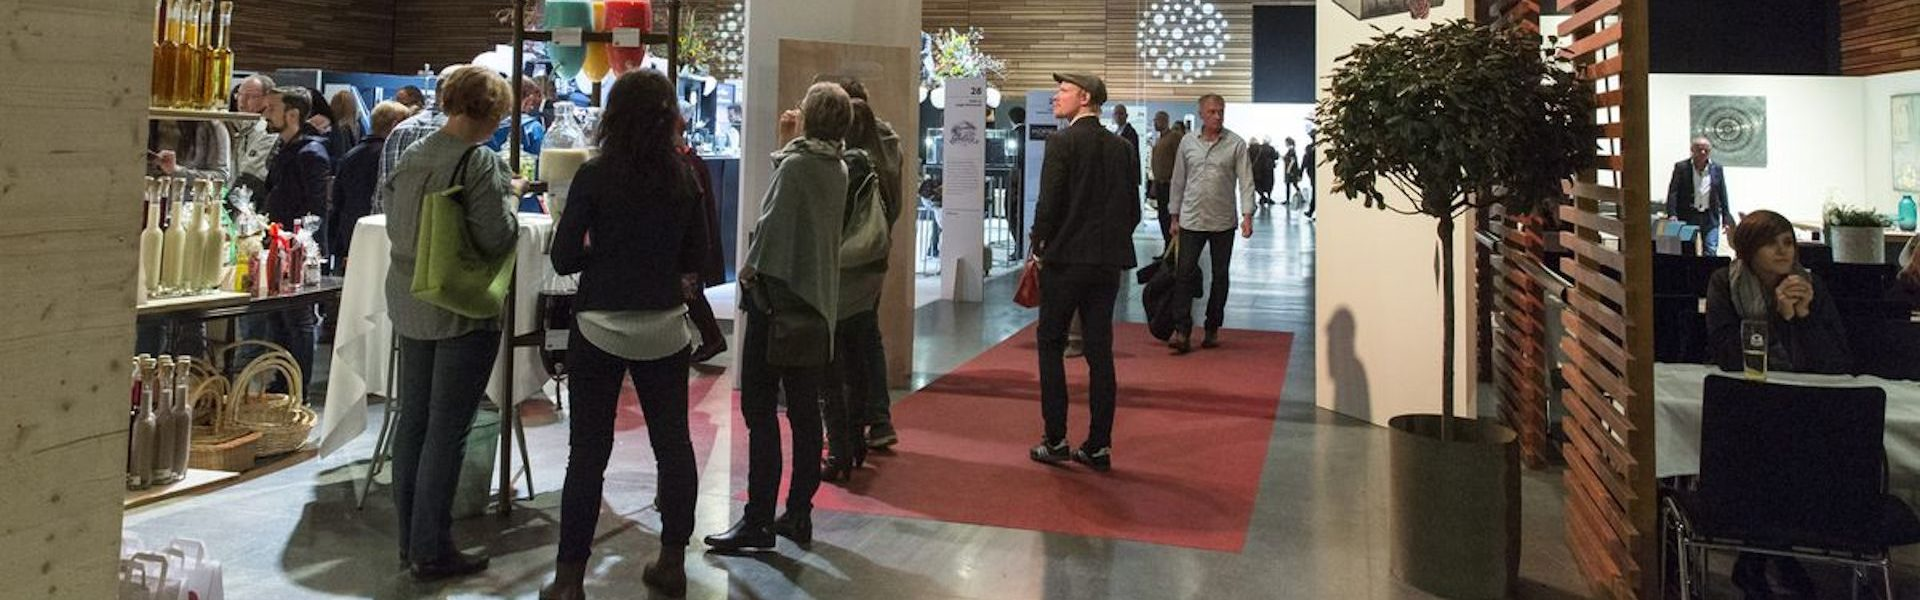 Messe Gustav, Design-Mode-Konsumkultur, gustav fair (c) Sarah Schmid / Dornbirner-Messe